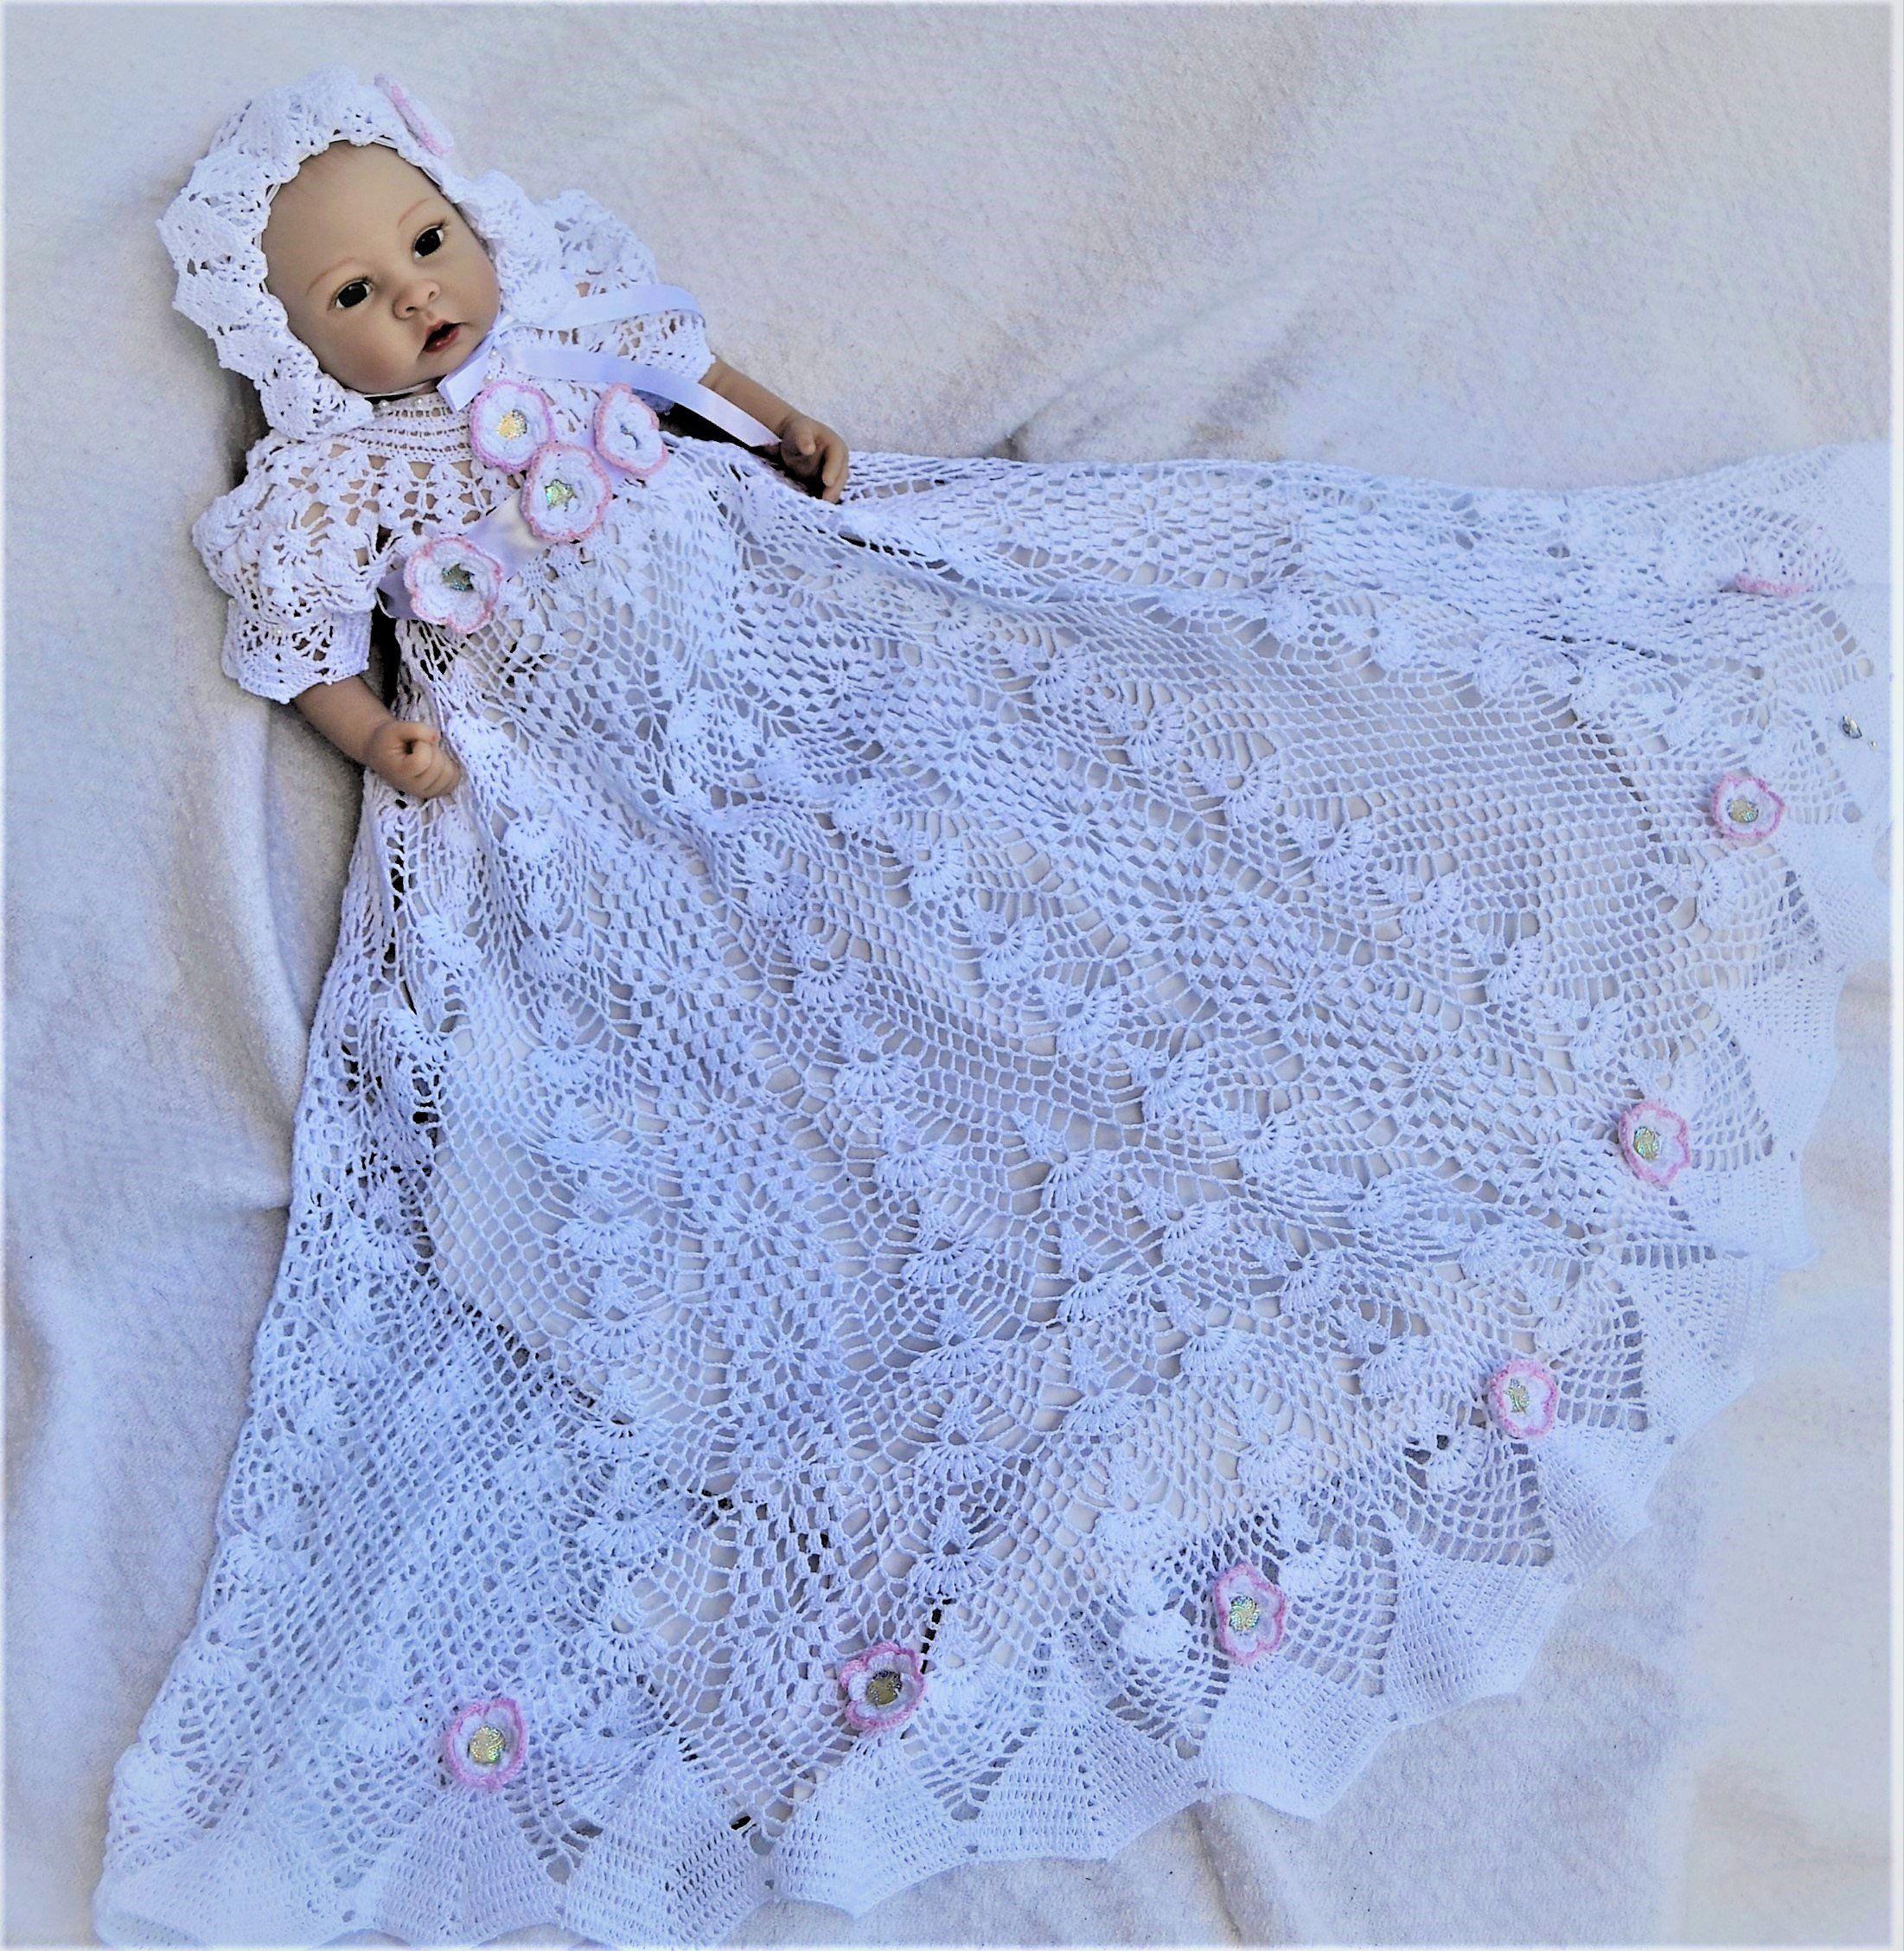 Hchv Hand Crochet Baby Lacy Christening Gown Crochet Baby